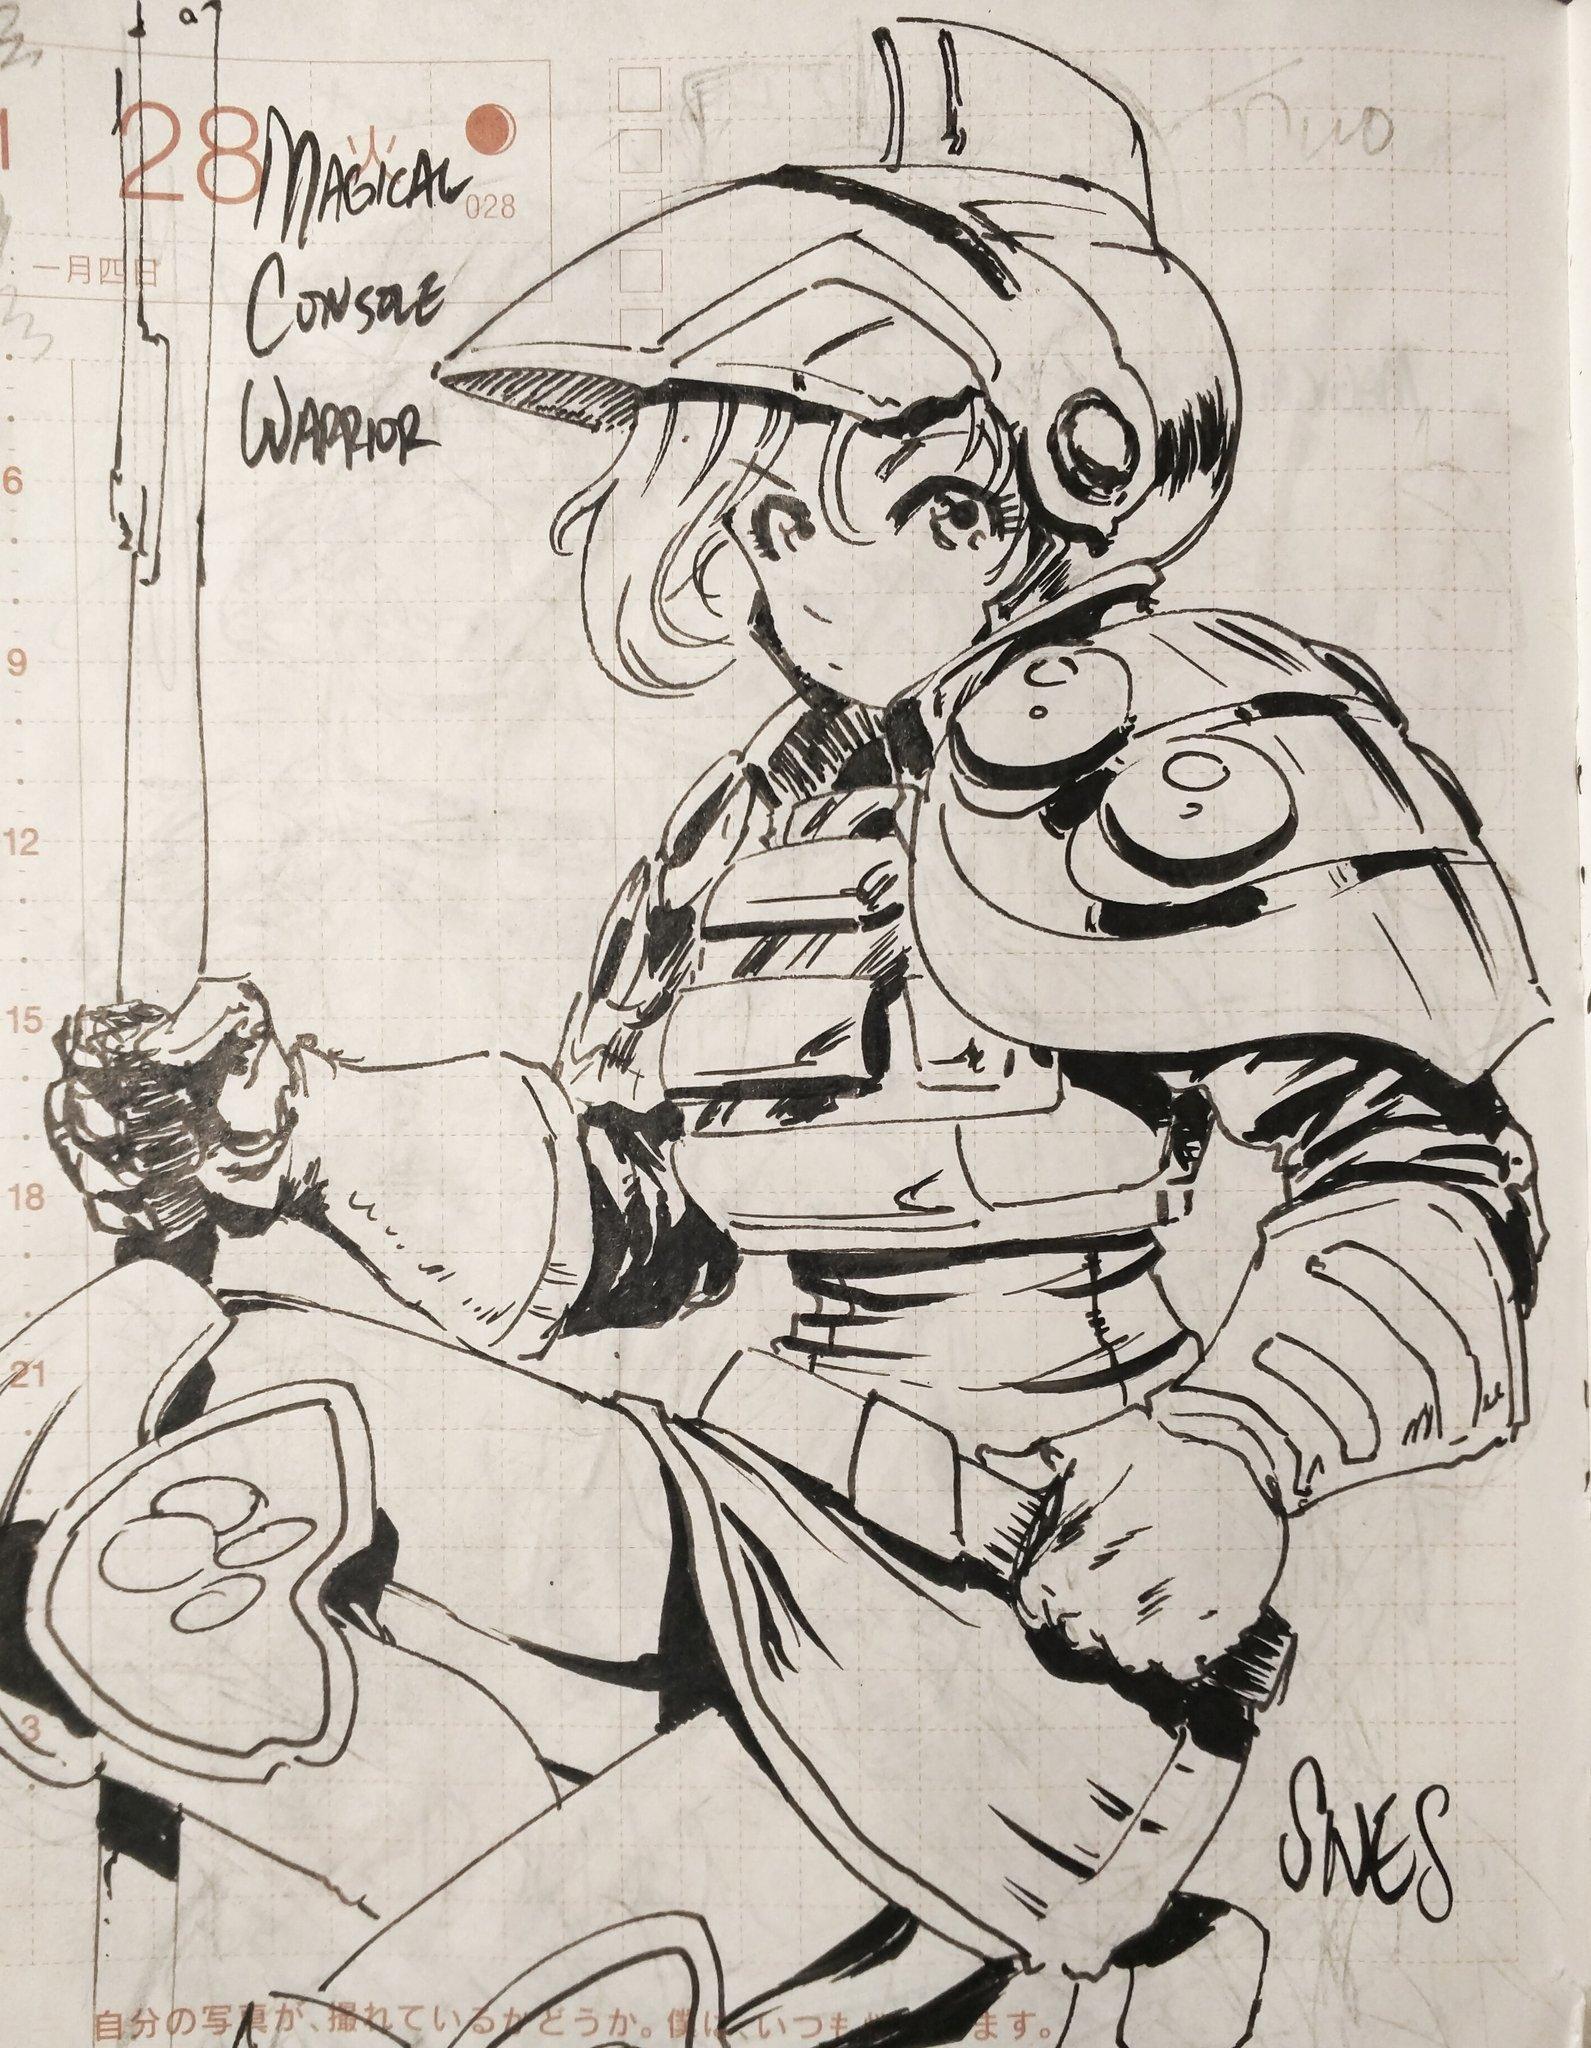 Magical Console Warrior SUPER NINTENDO